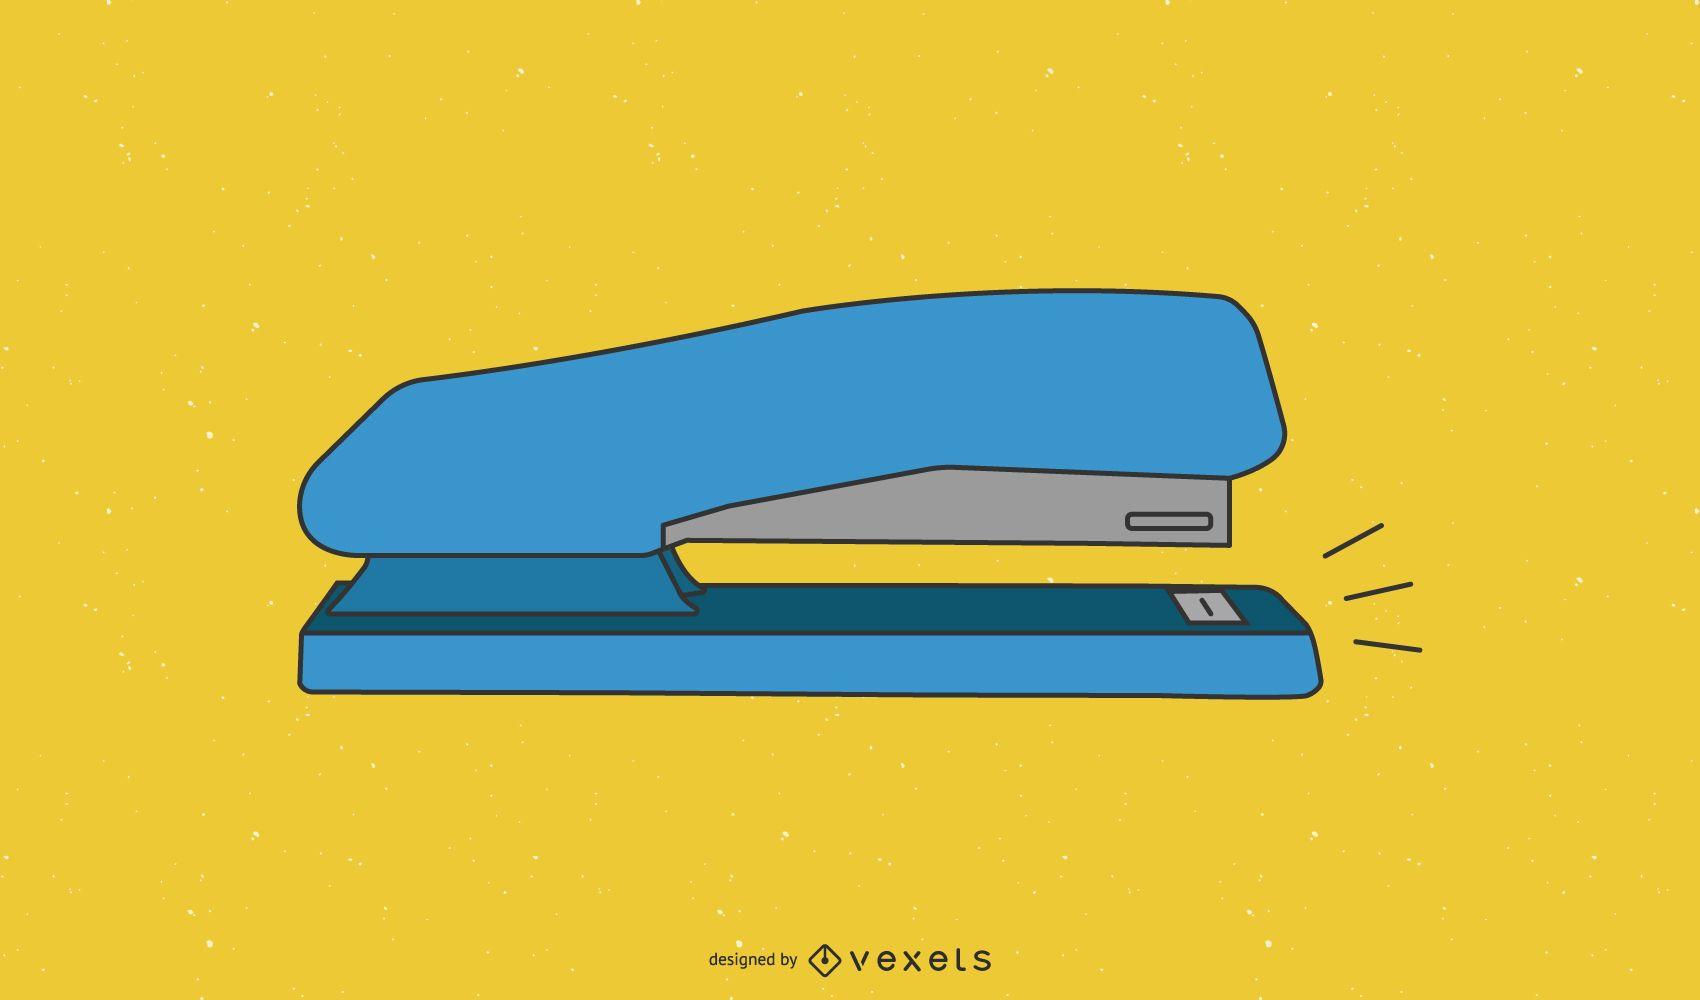 Blue Stapler of an Office Stationary Tool